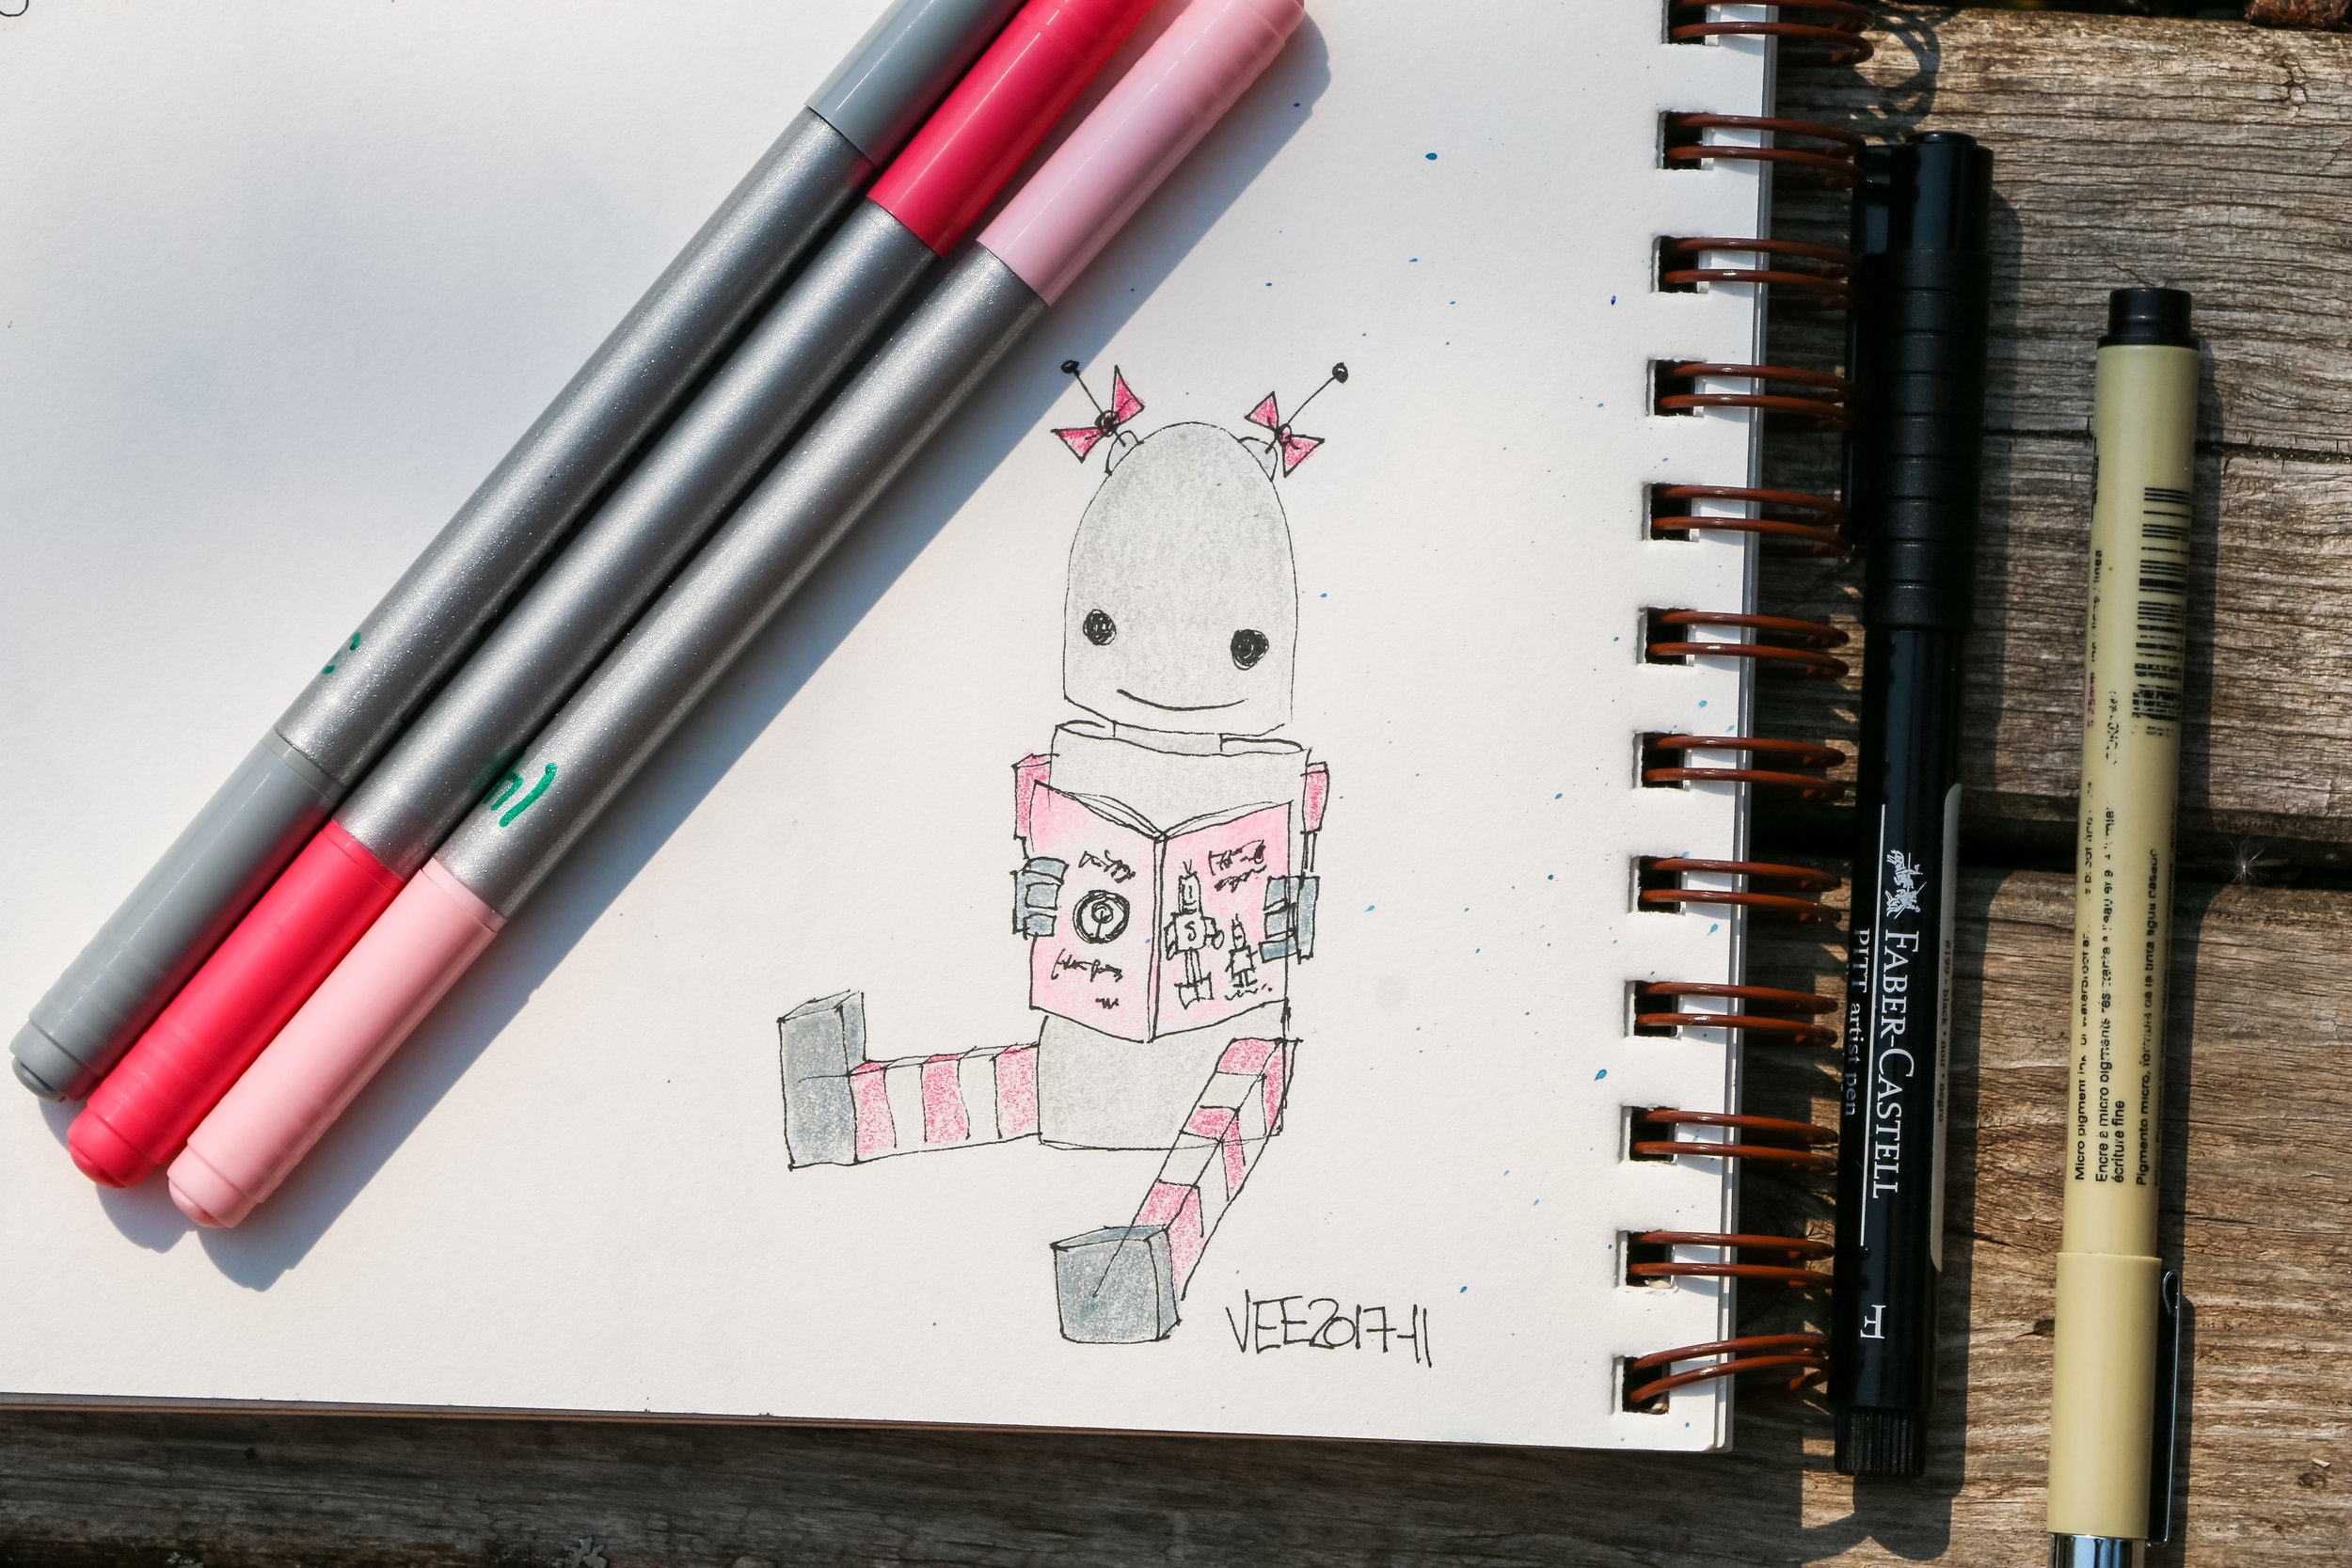 September 16, 2017 robot #9